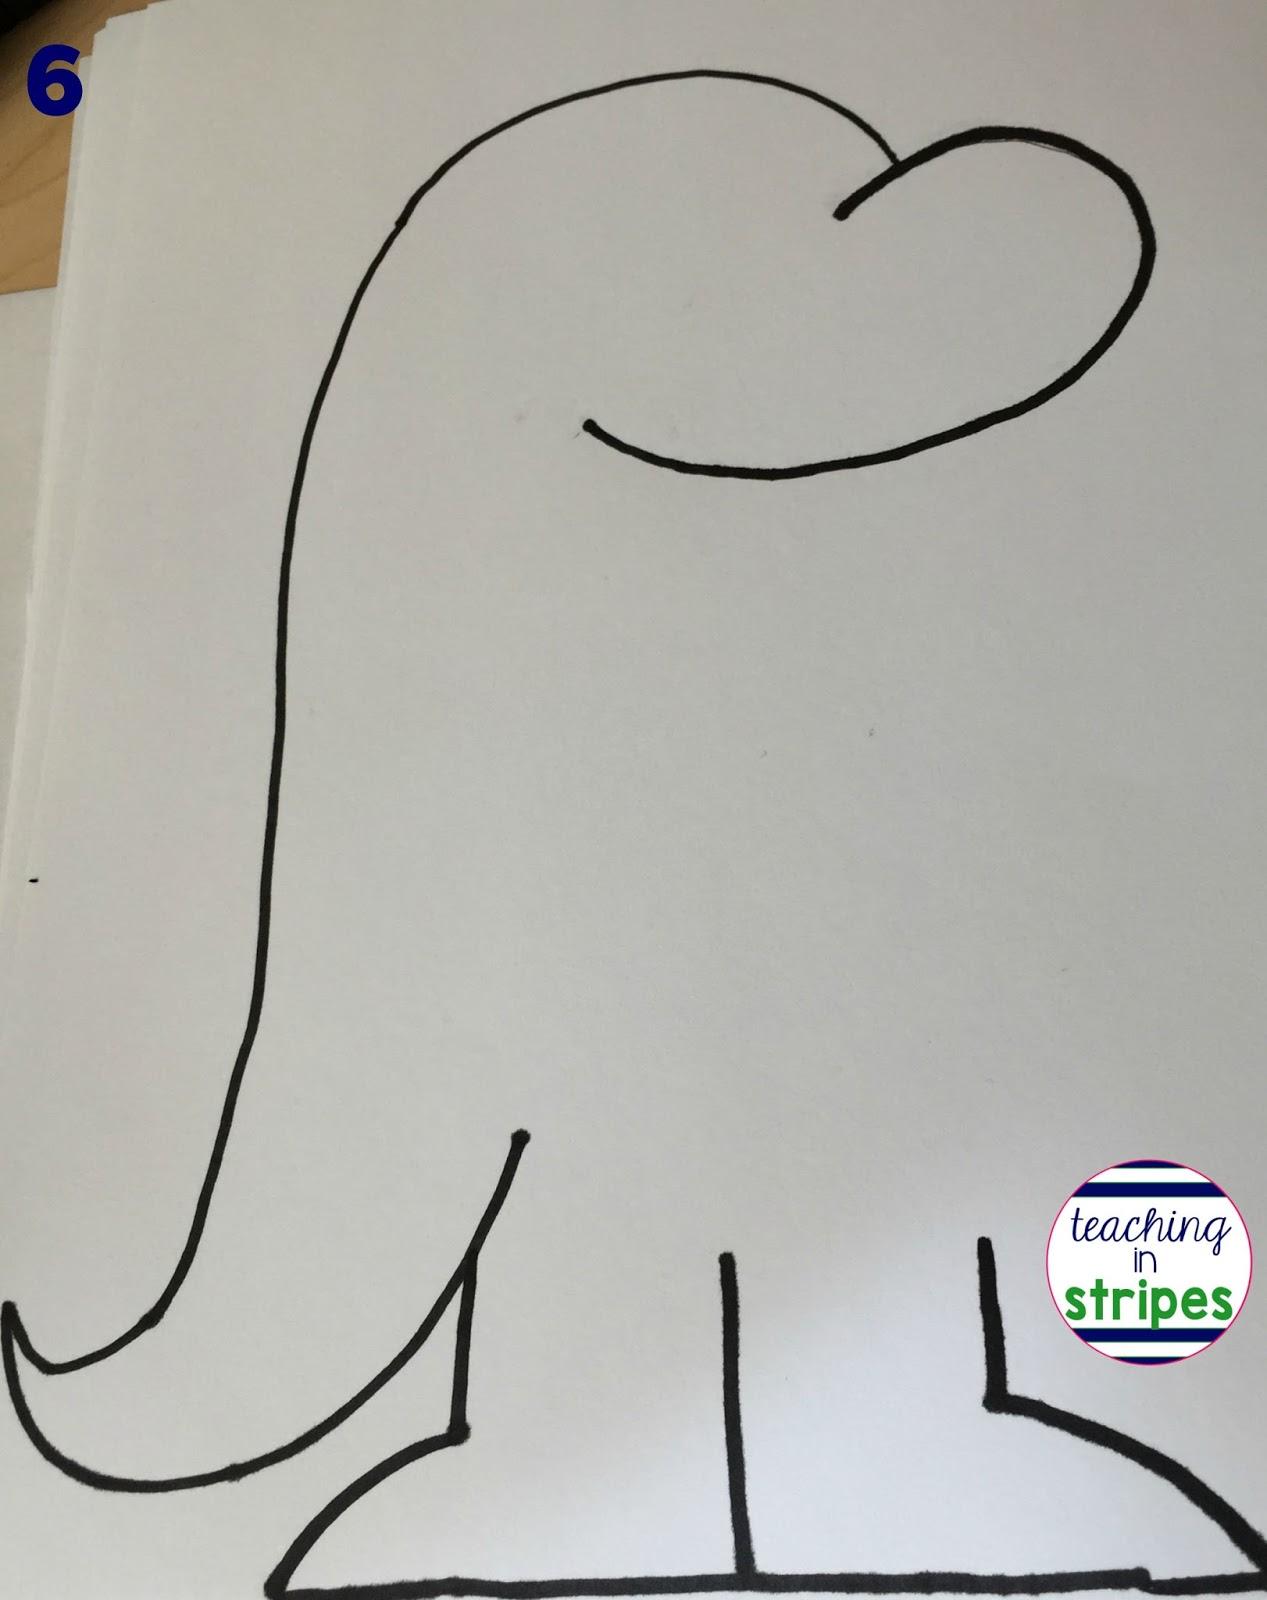 dav pilkey dragon coloring pages - photo#32